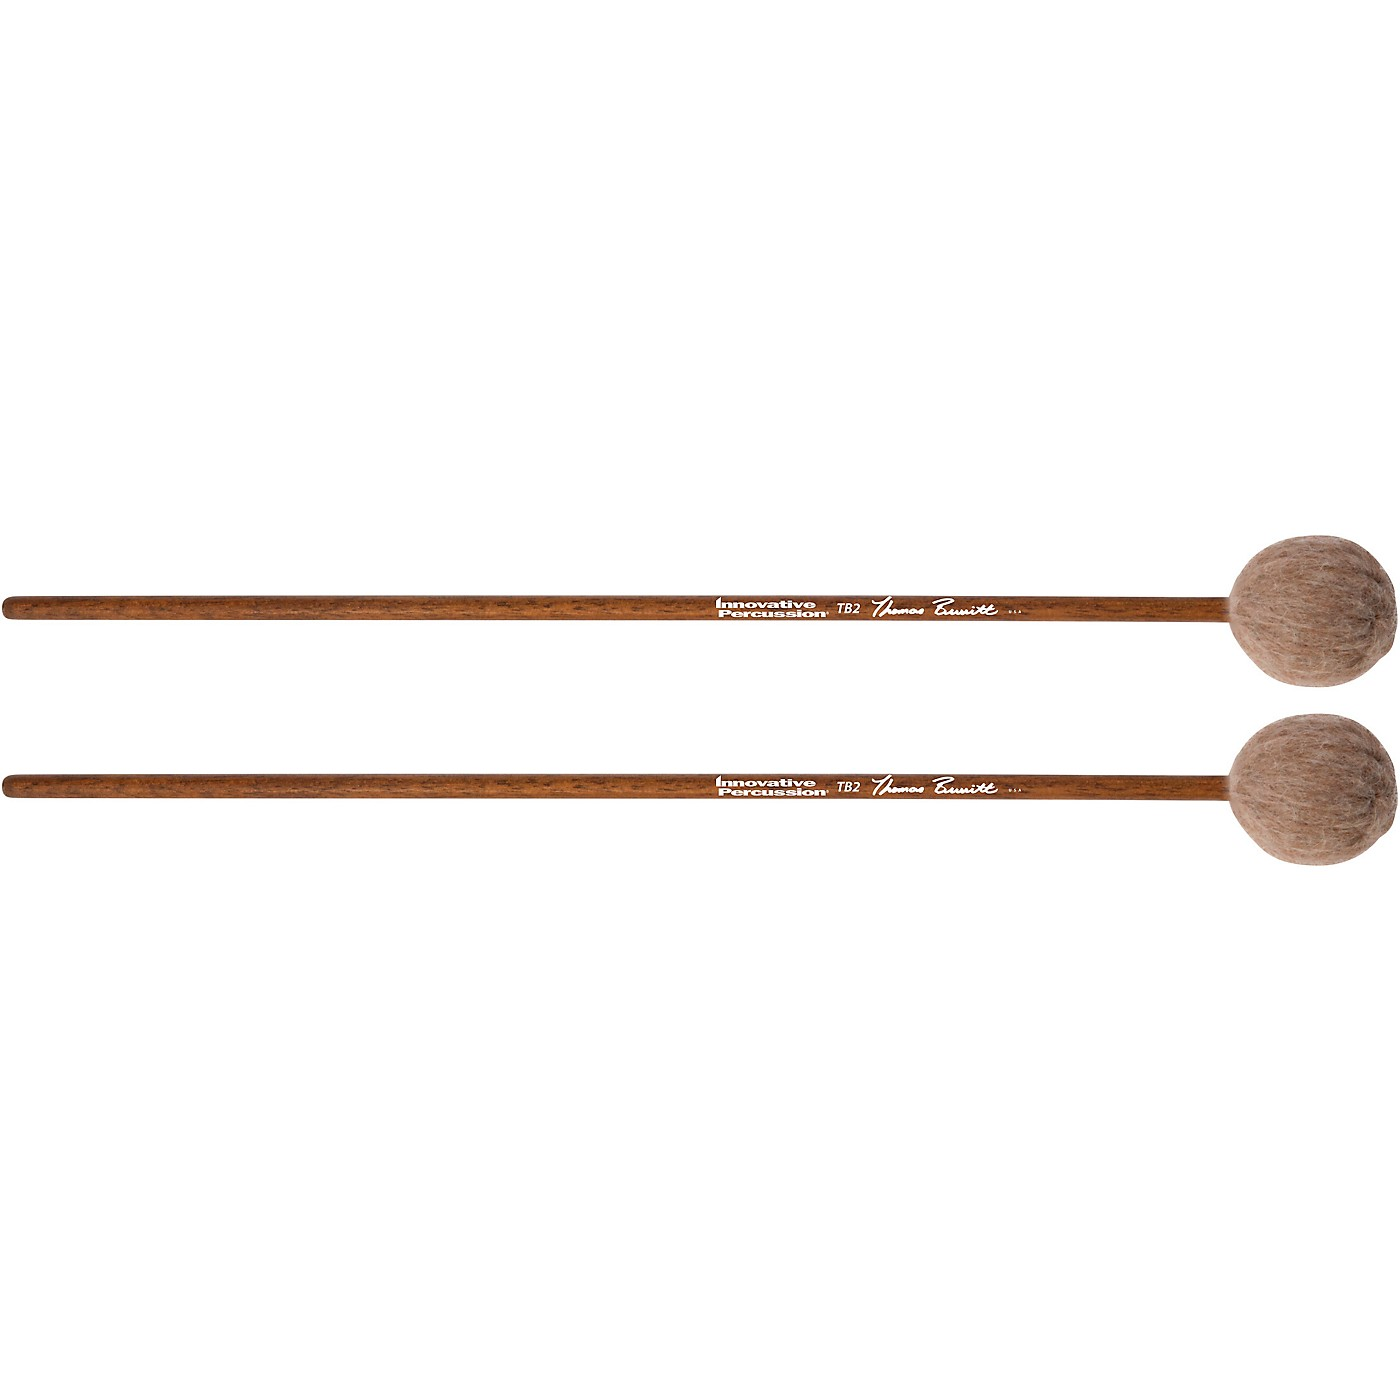 Innovative Percussion Thomas Burritt Series Ramin Marimba Mallets thumbnail